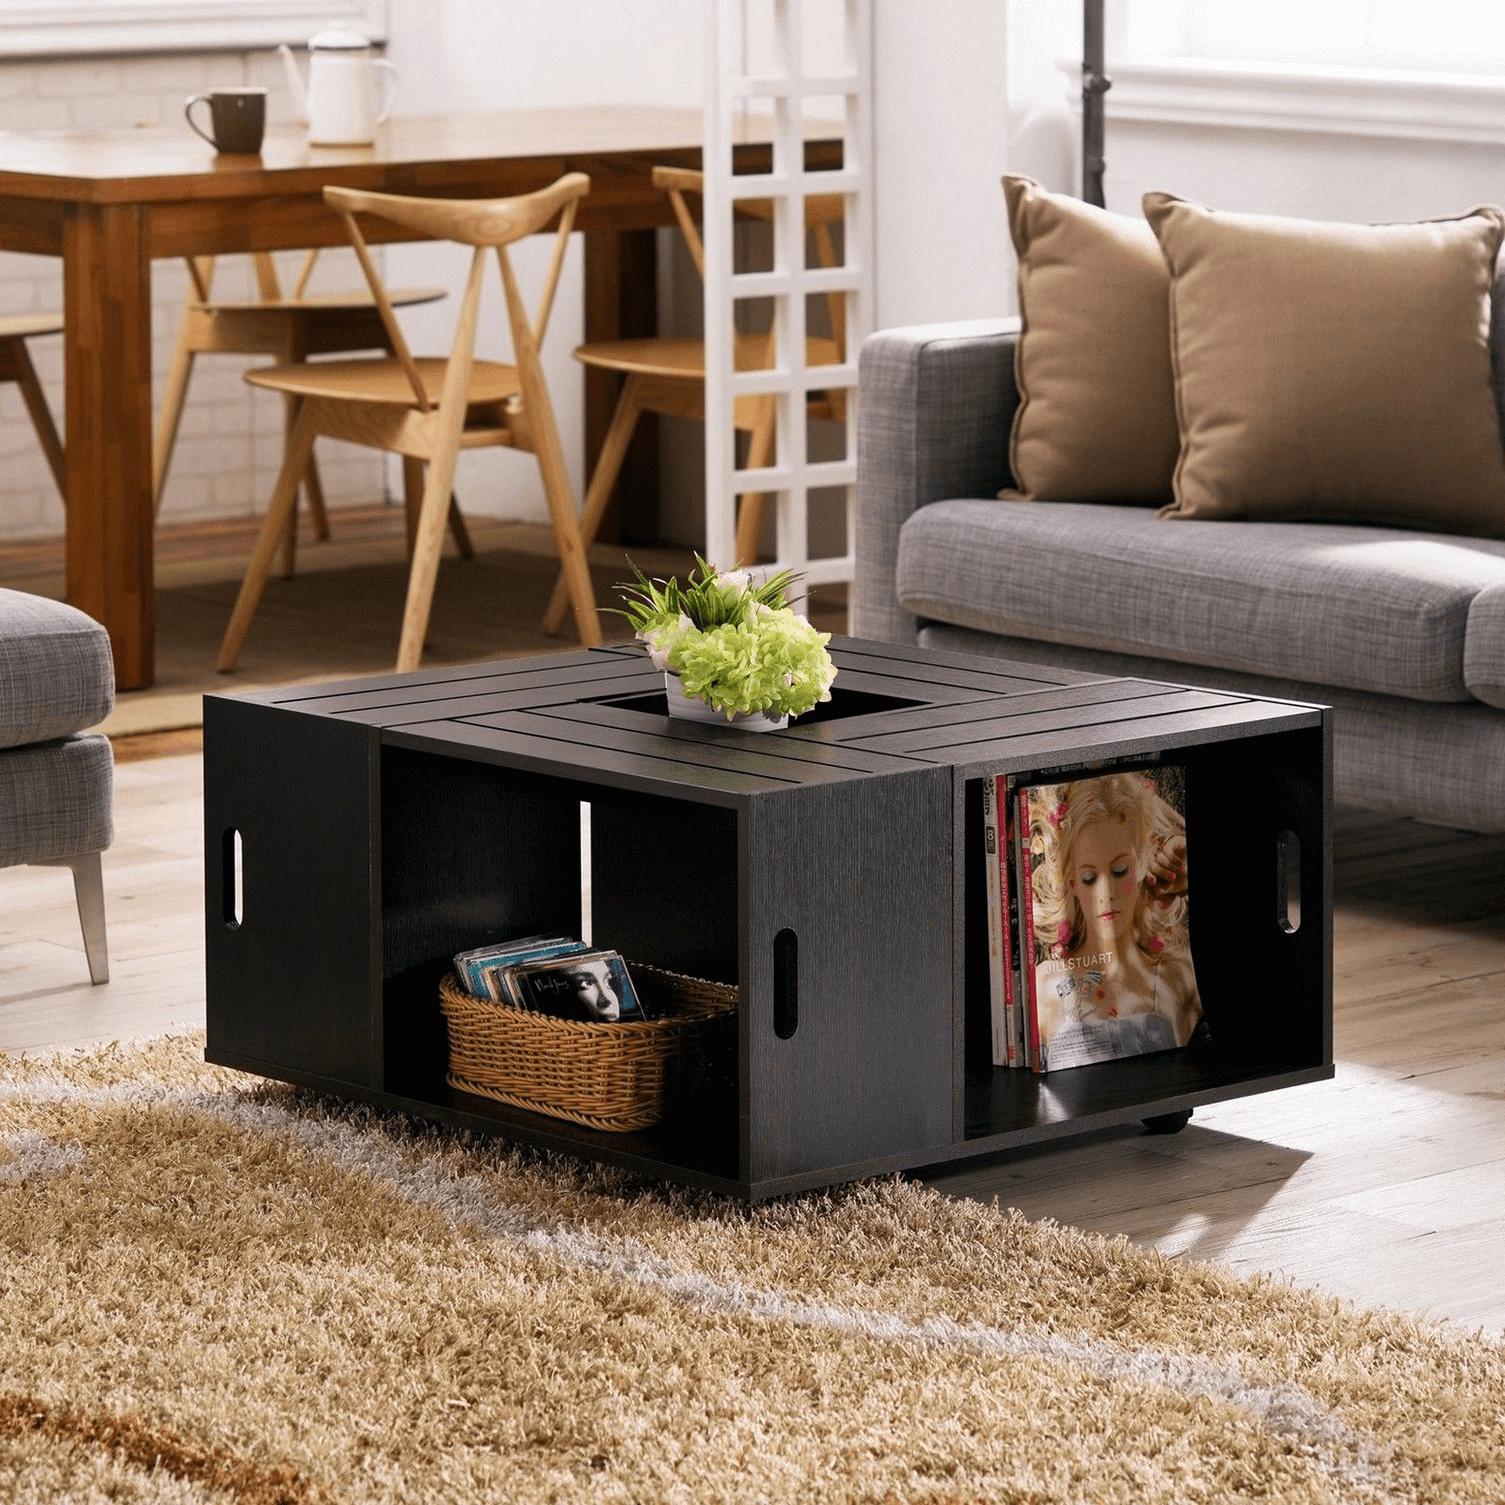 Black wooden coffee table design ideas